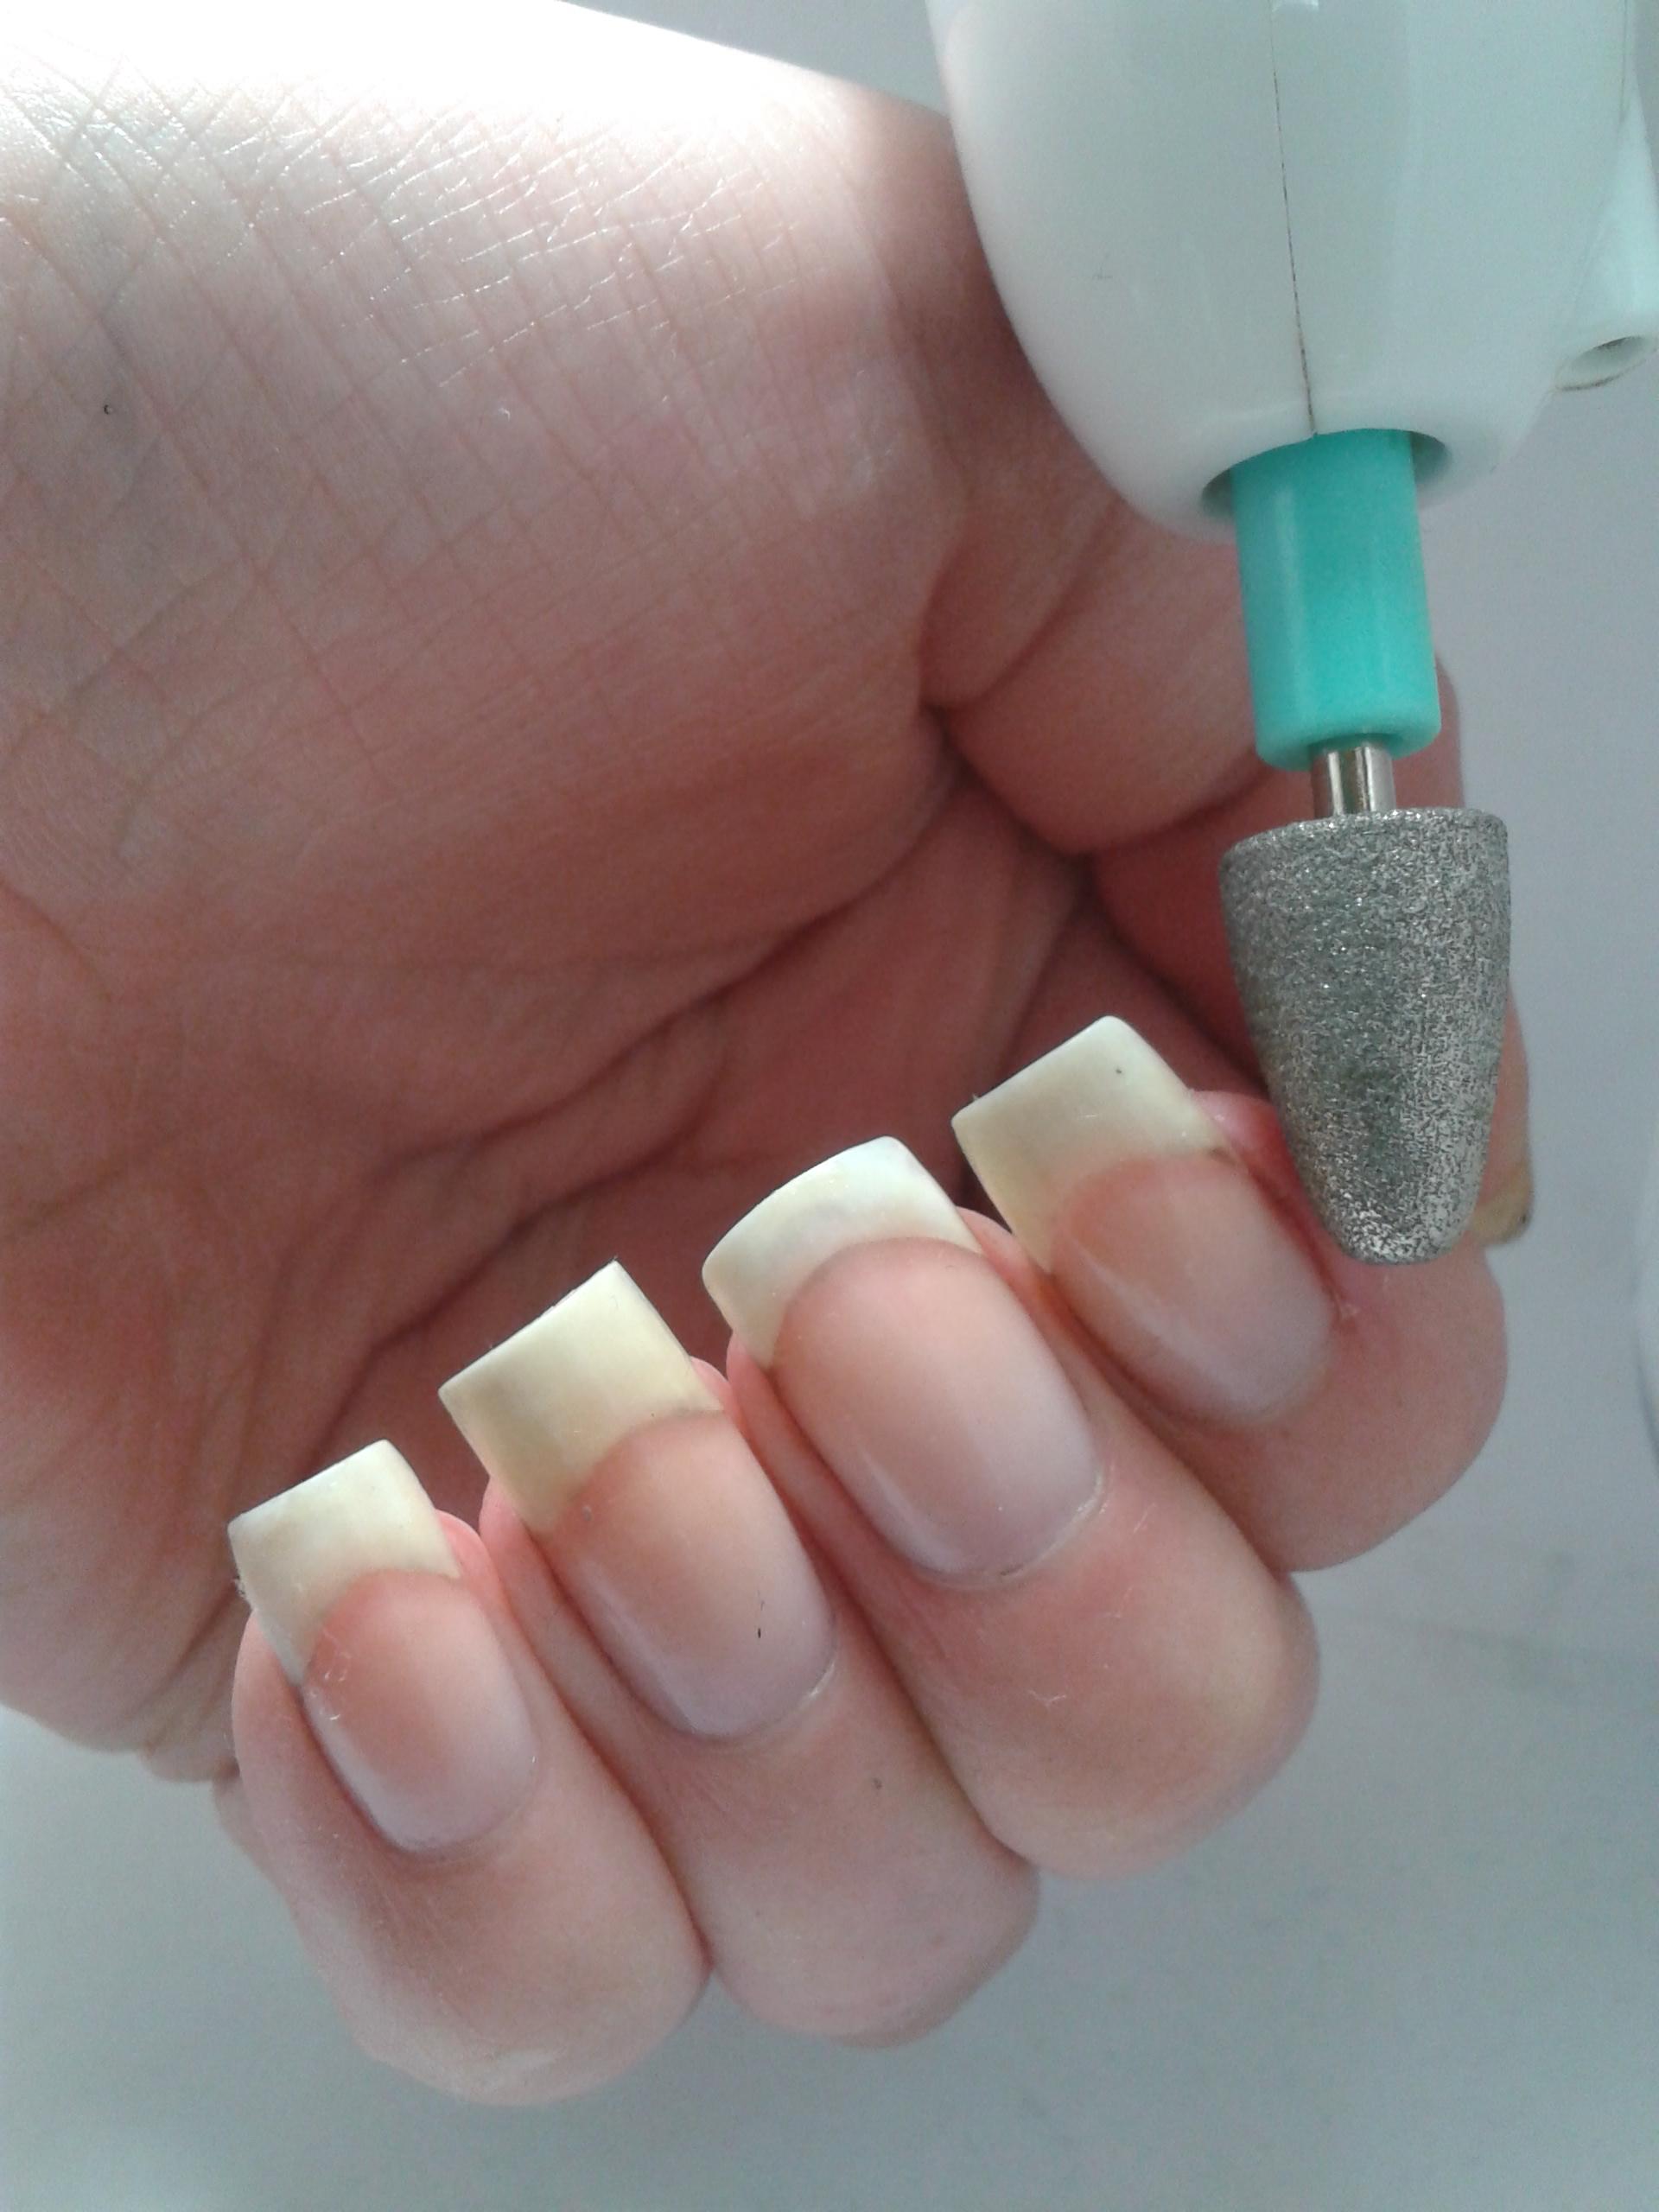 Nail Drill Review Thenailpolishbottle